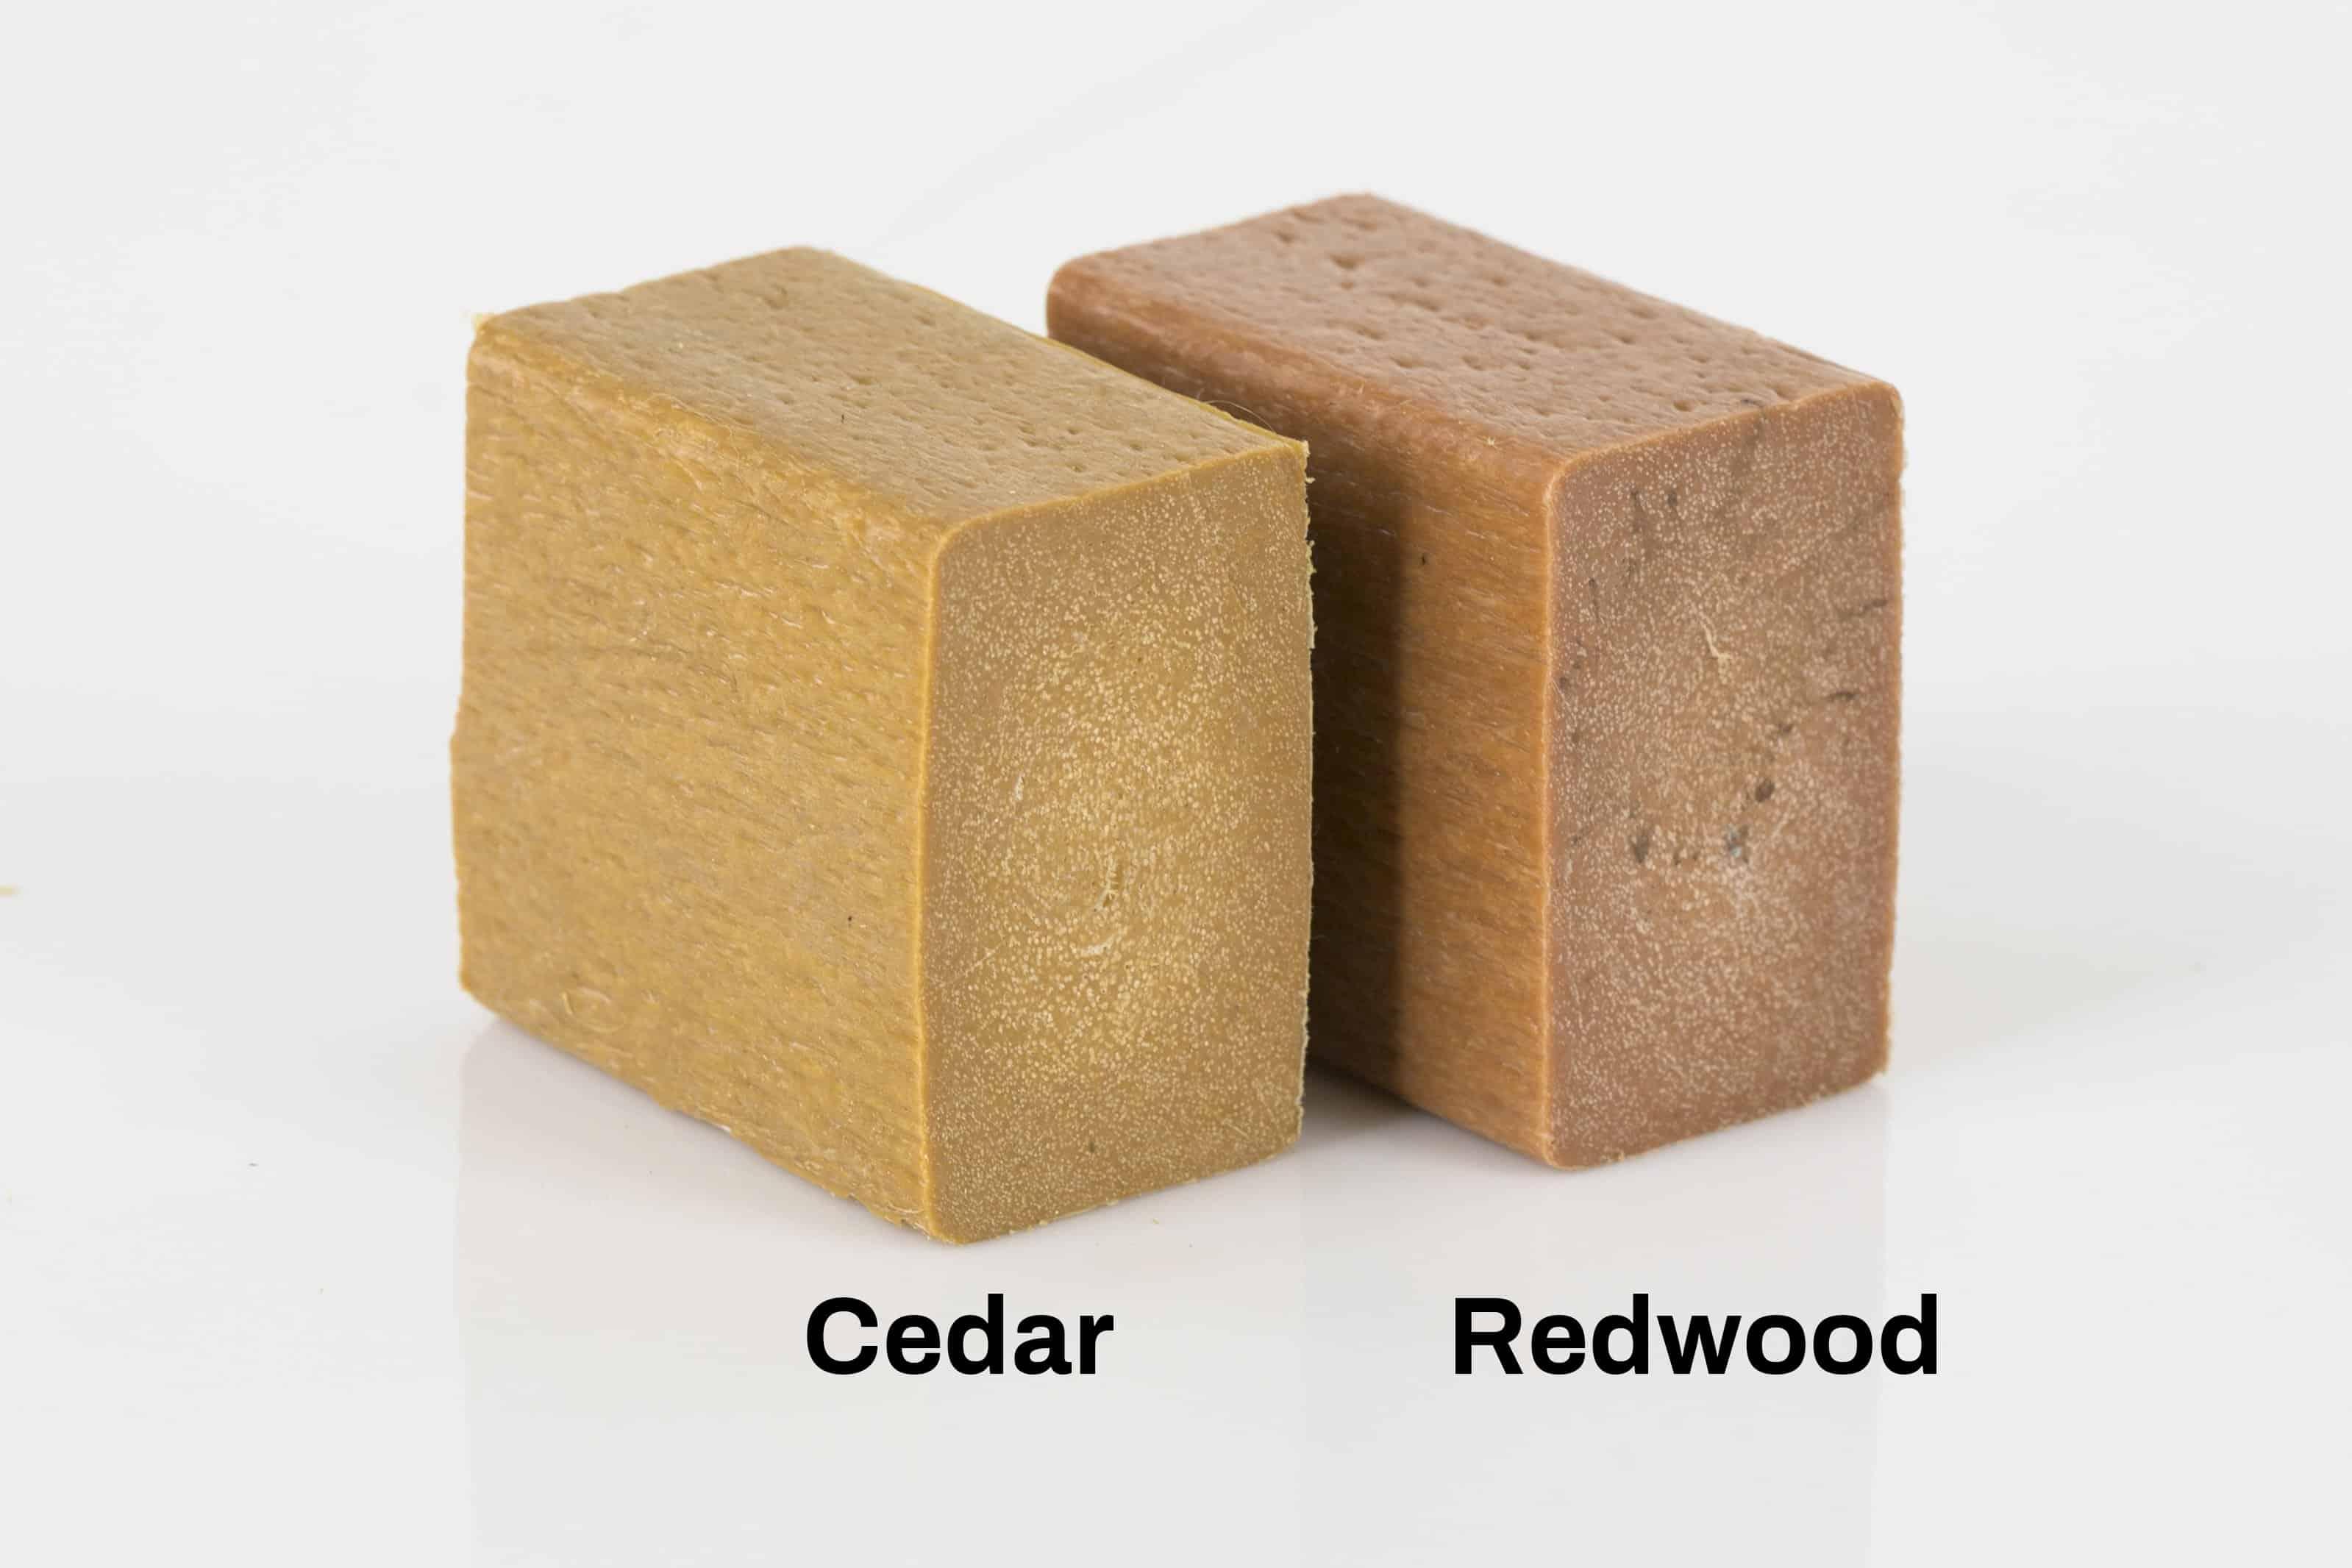 Magnificent Cast Aluminum Woodland Park Bench With Back White Oak Slats Beatyapartments Chair Design Images Beatyapartmentscom